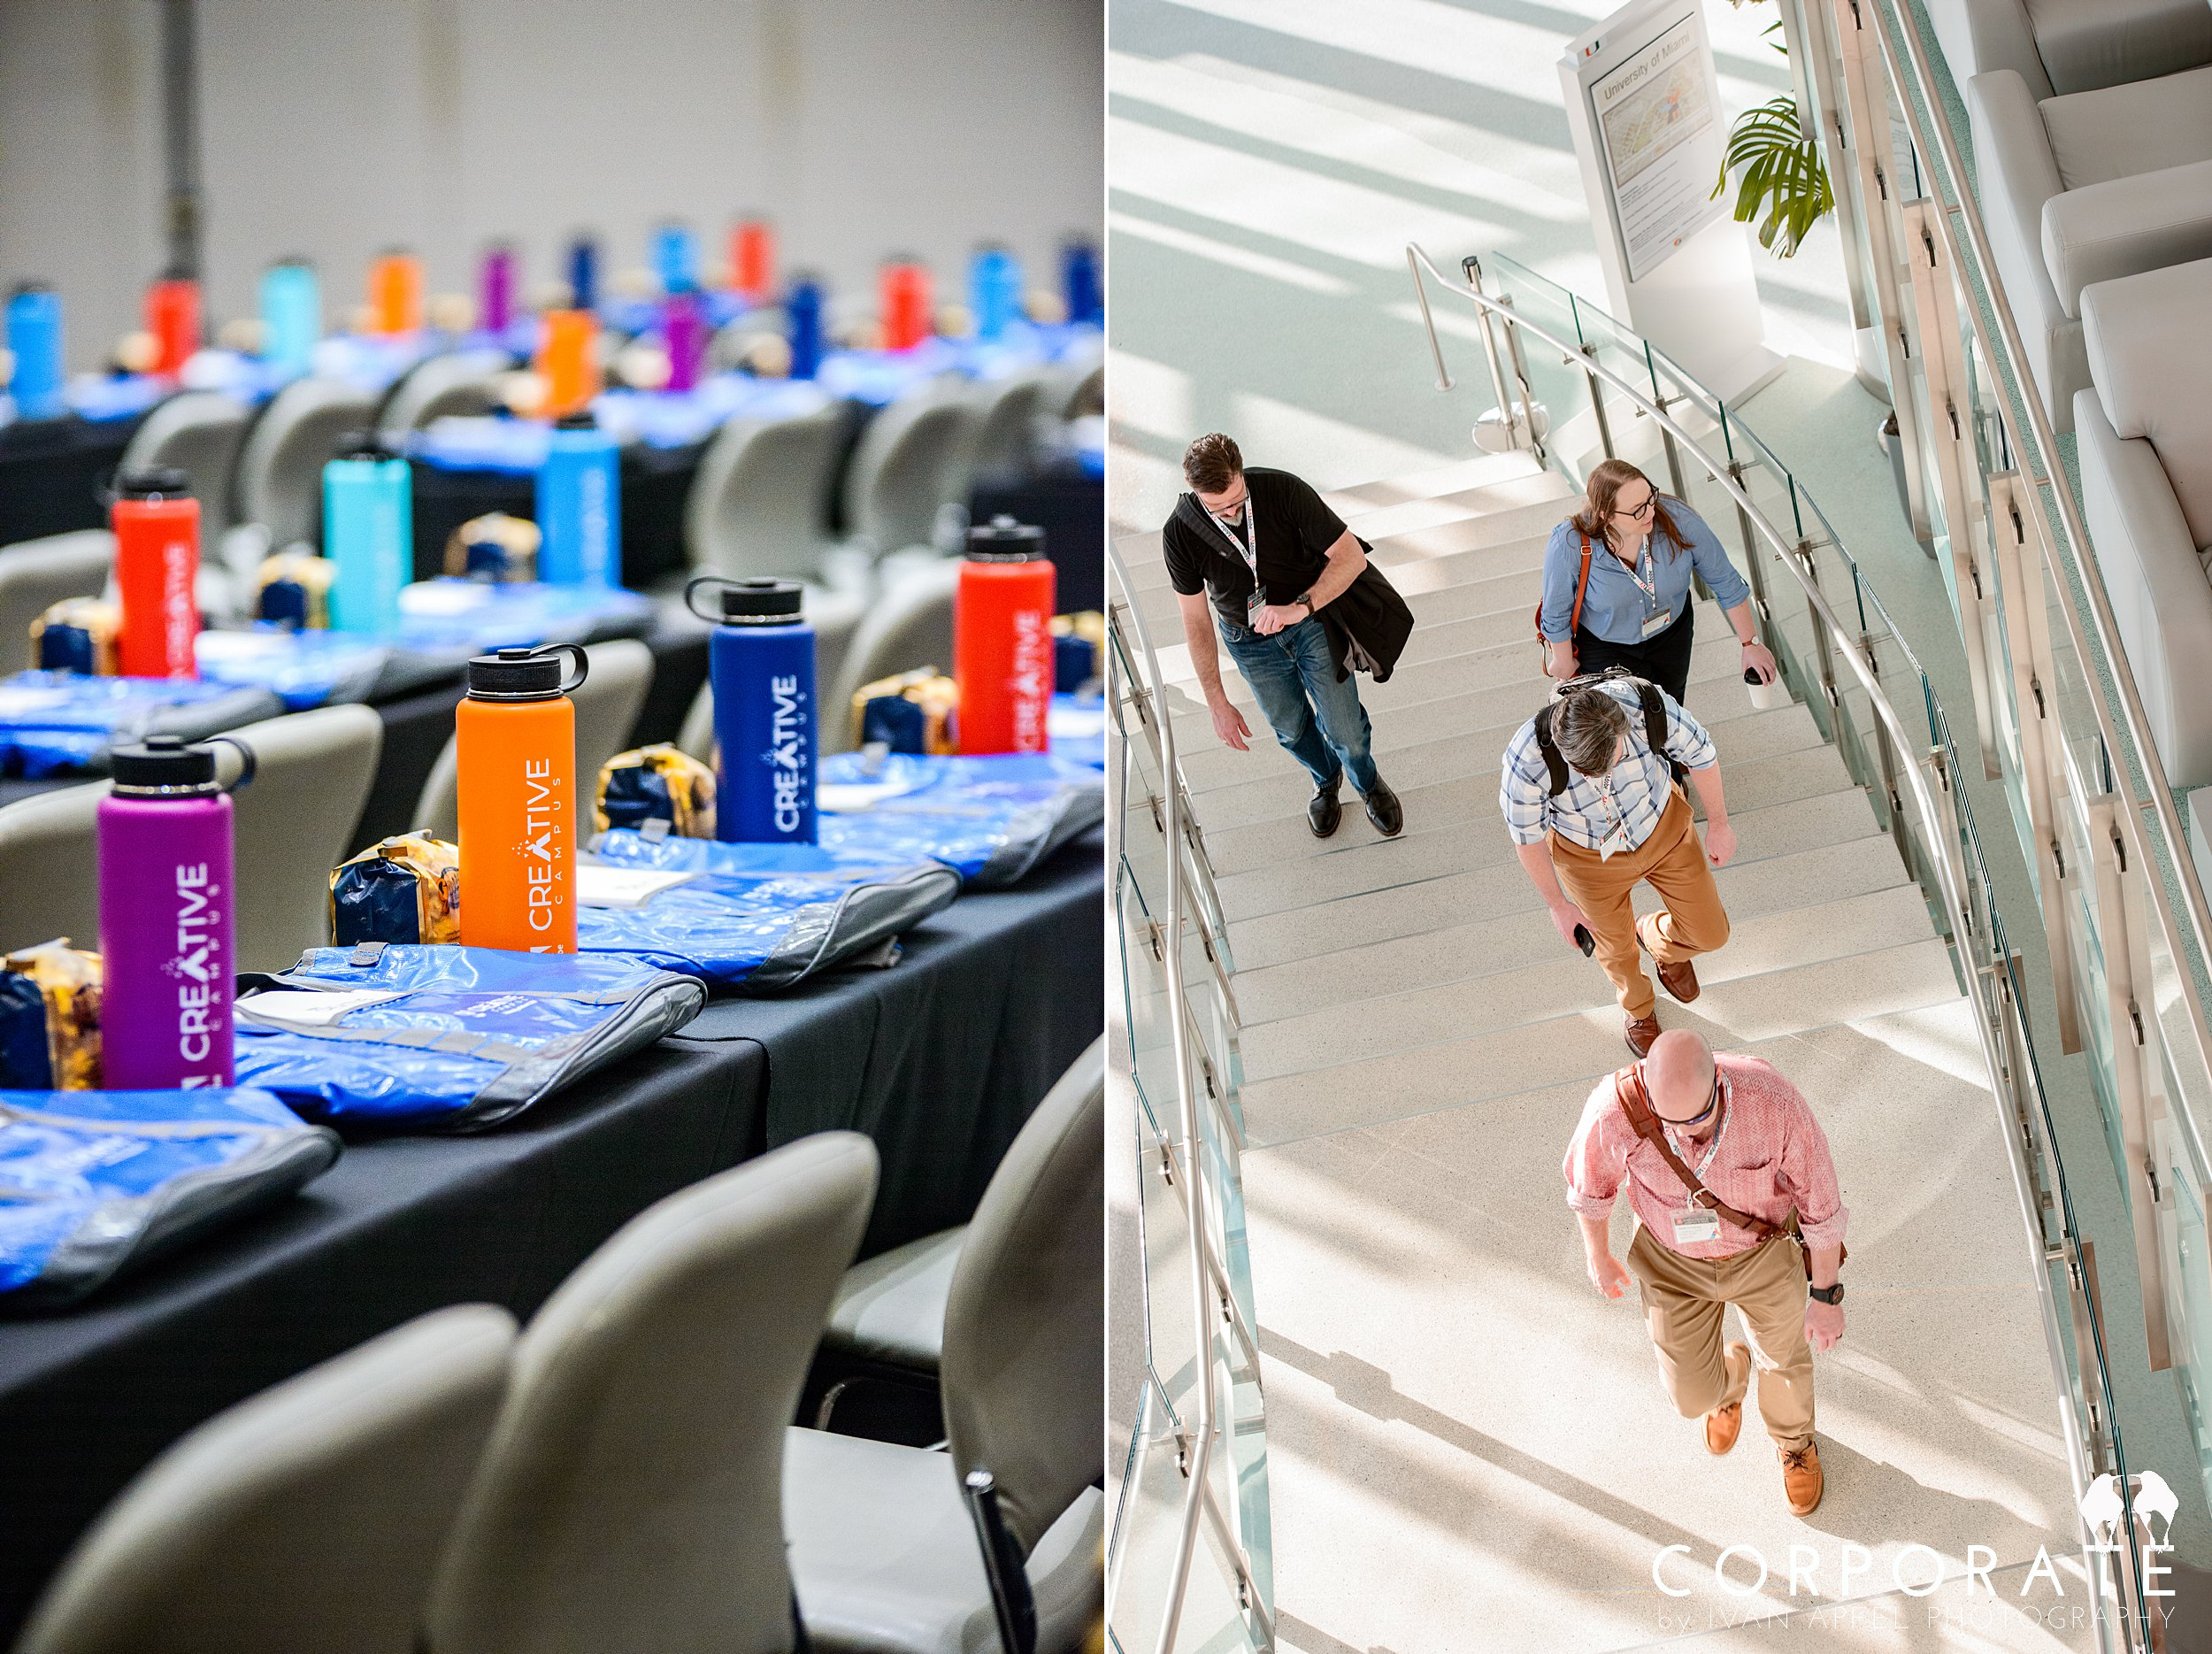 Miami Corporate Event Photographer Adobe Systems Creative Campus 2019-D2_Adobe_Creative_Campus_UMiami-_IAP8077.jpg